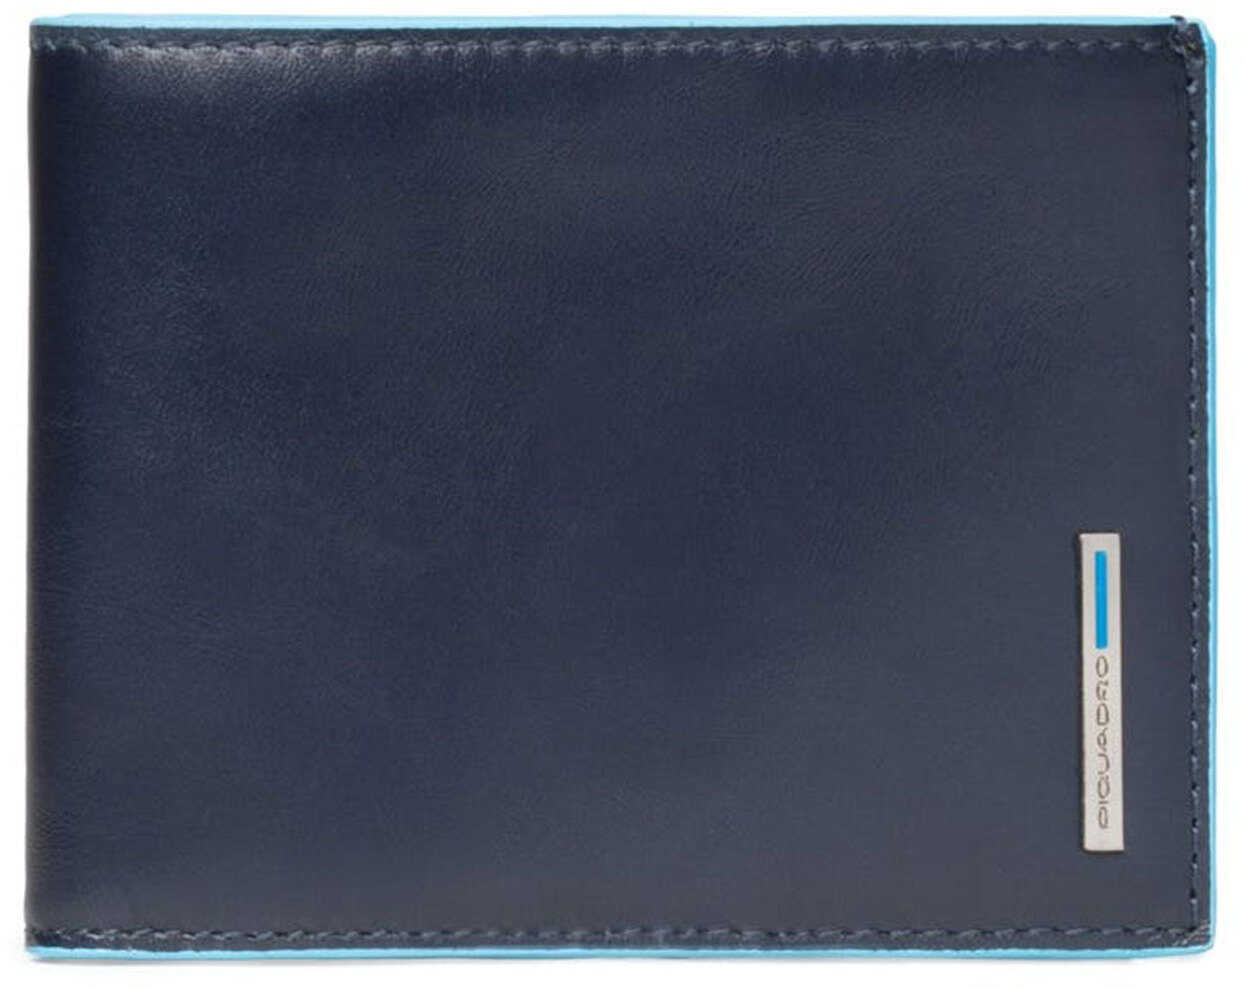 Piquadro Wallet Blue